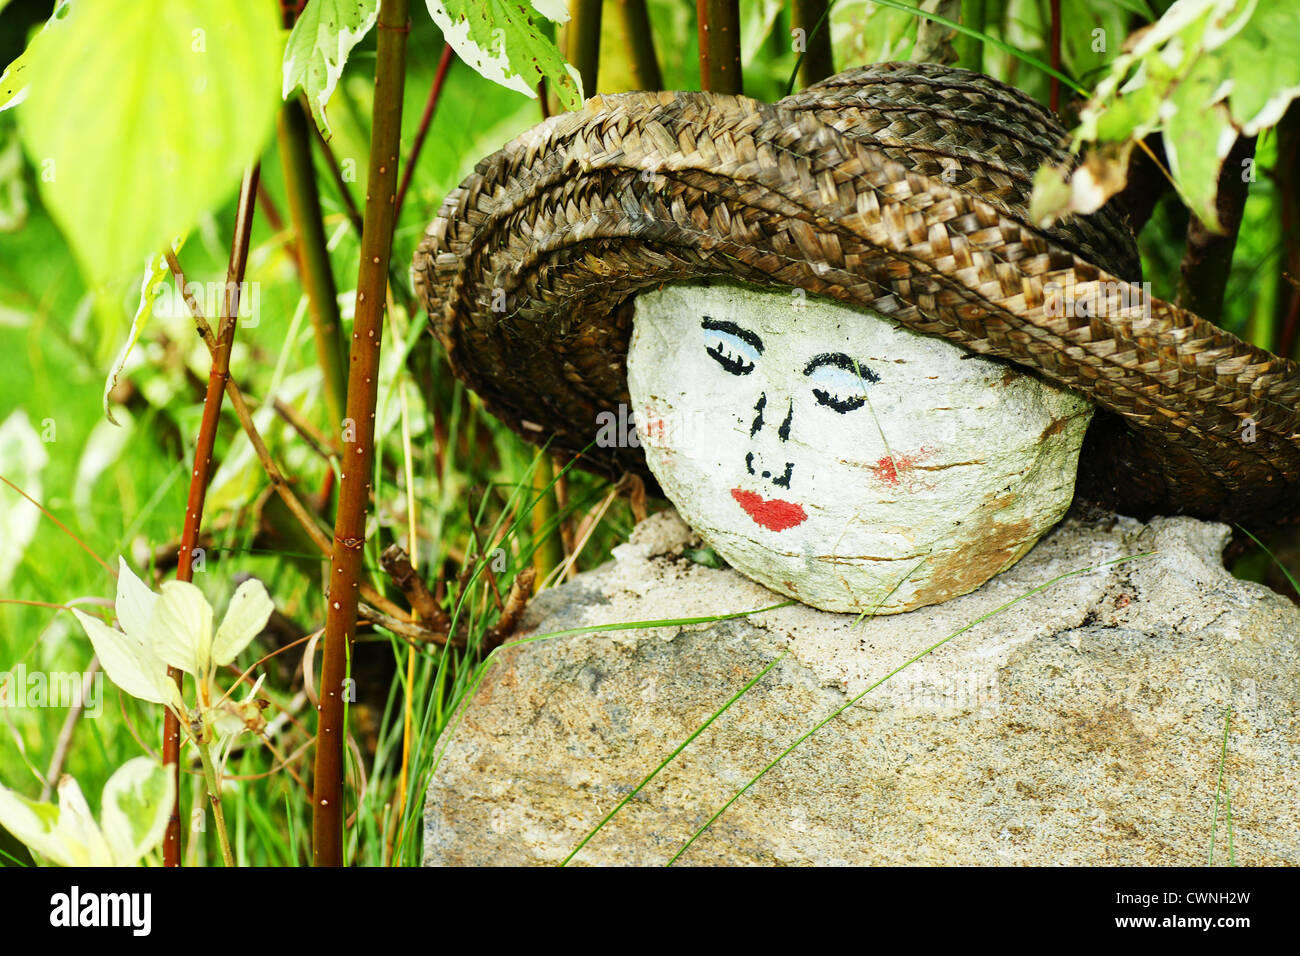 Homemade garden art - Original Homemade Garden Decoration With Round Painted Rock As A Woman S Face With Straw Hat Hidden